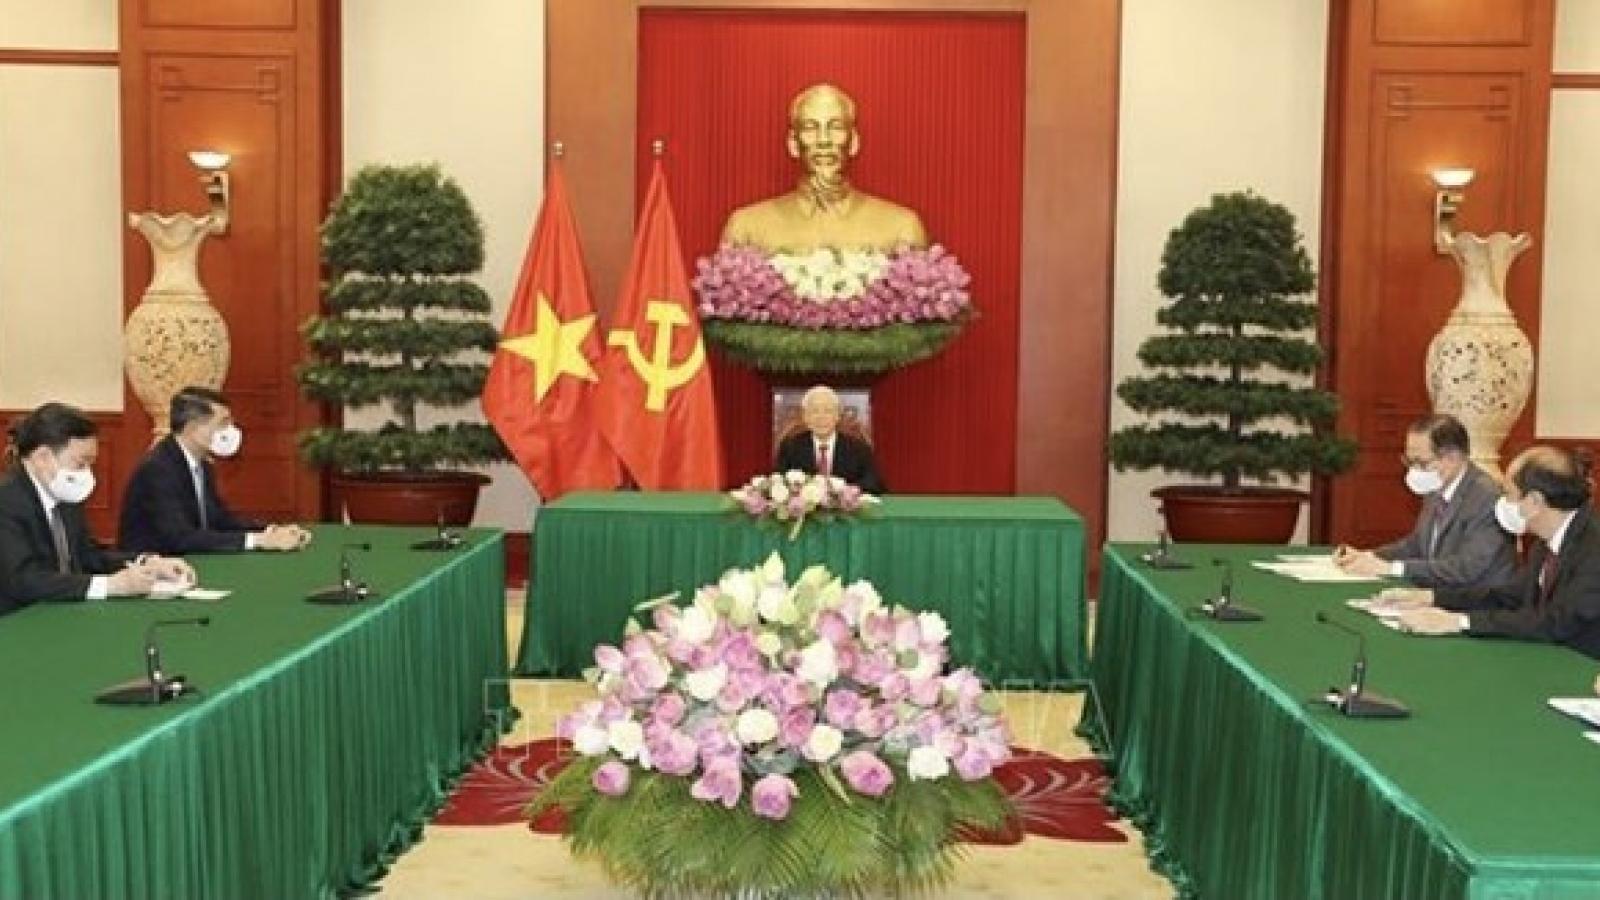 Vietnam treasures ties with Sri Lanka: Party chief